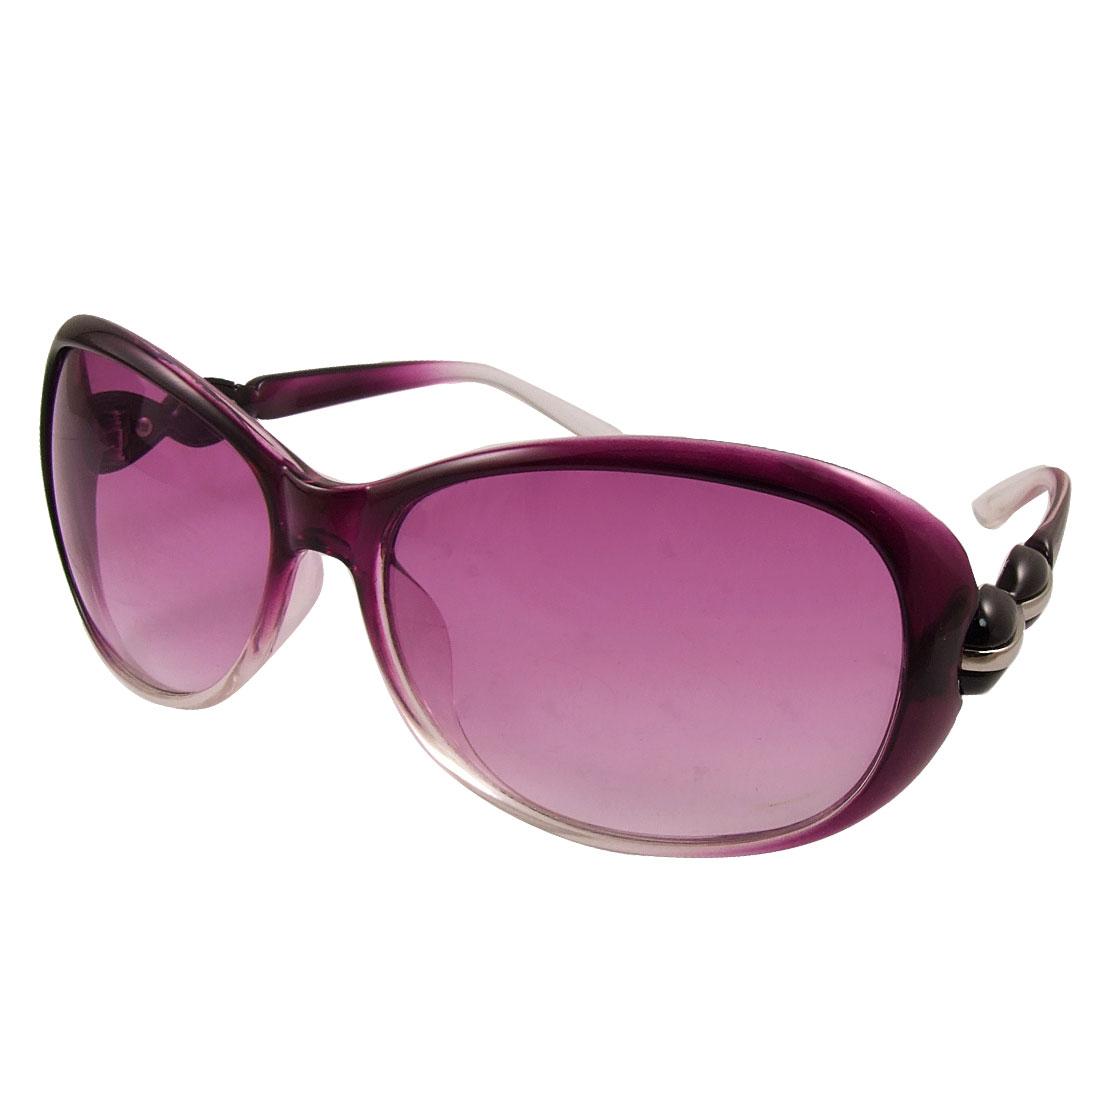 Purple Plastic Full Rim Single Bridge Sunglasses for Woman